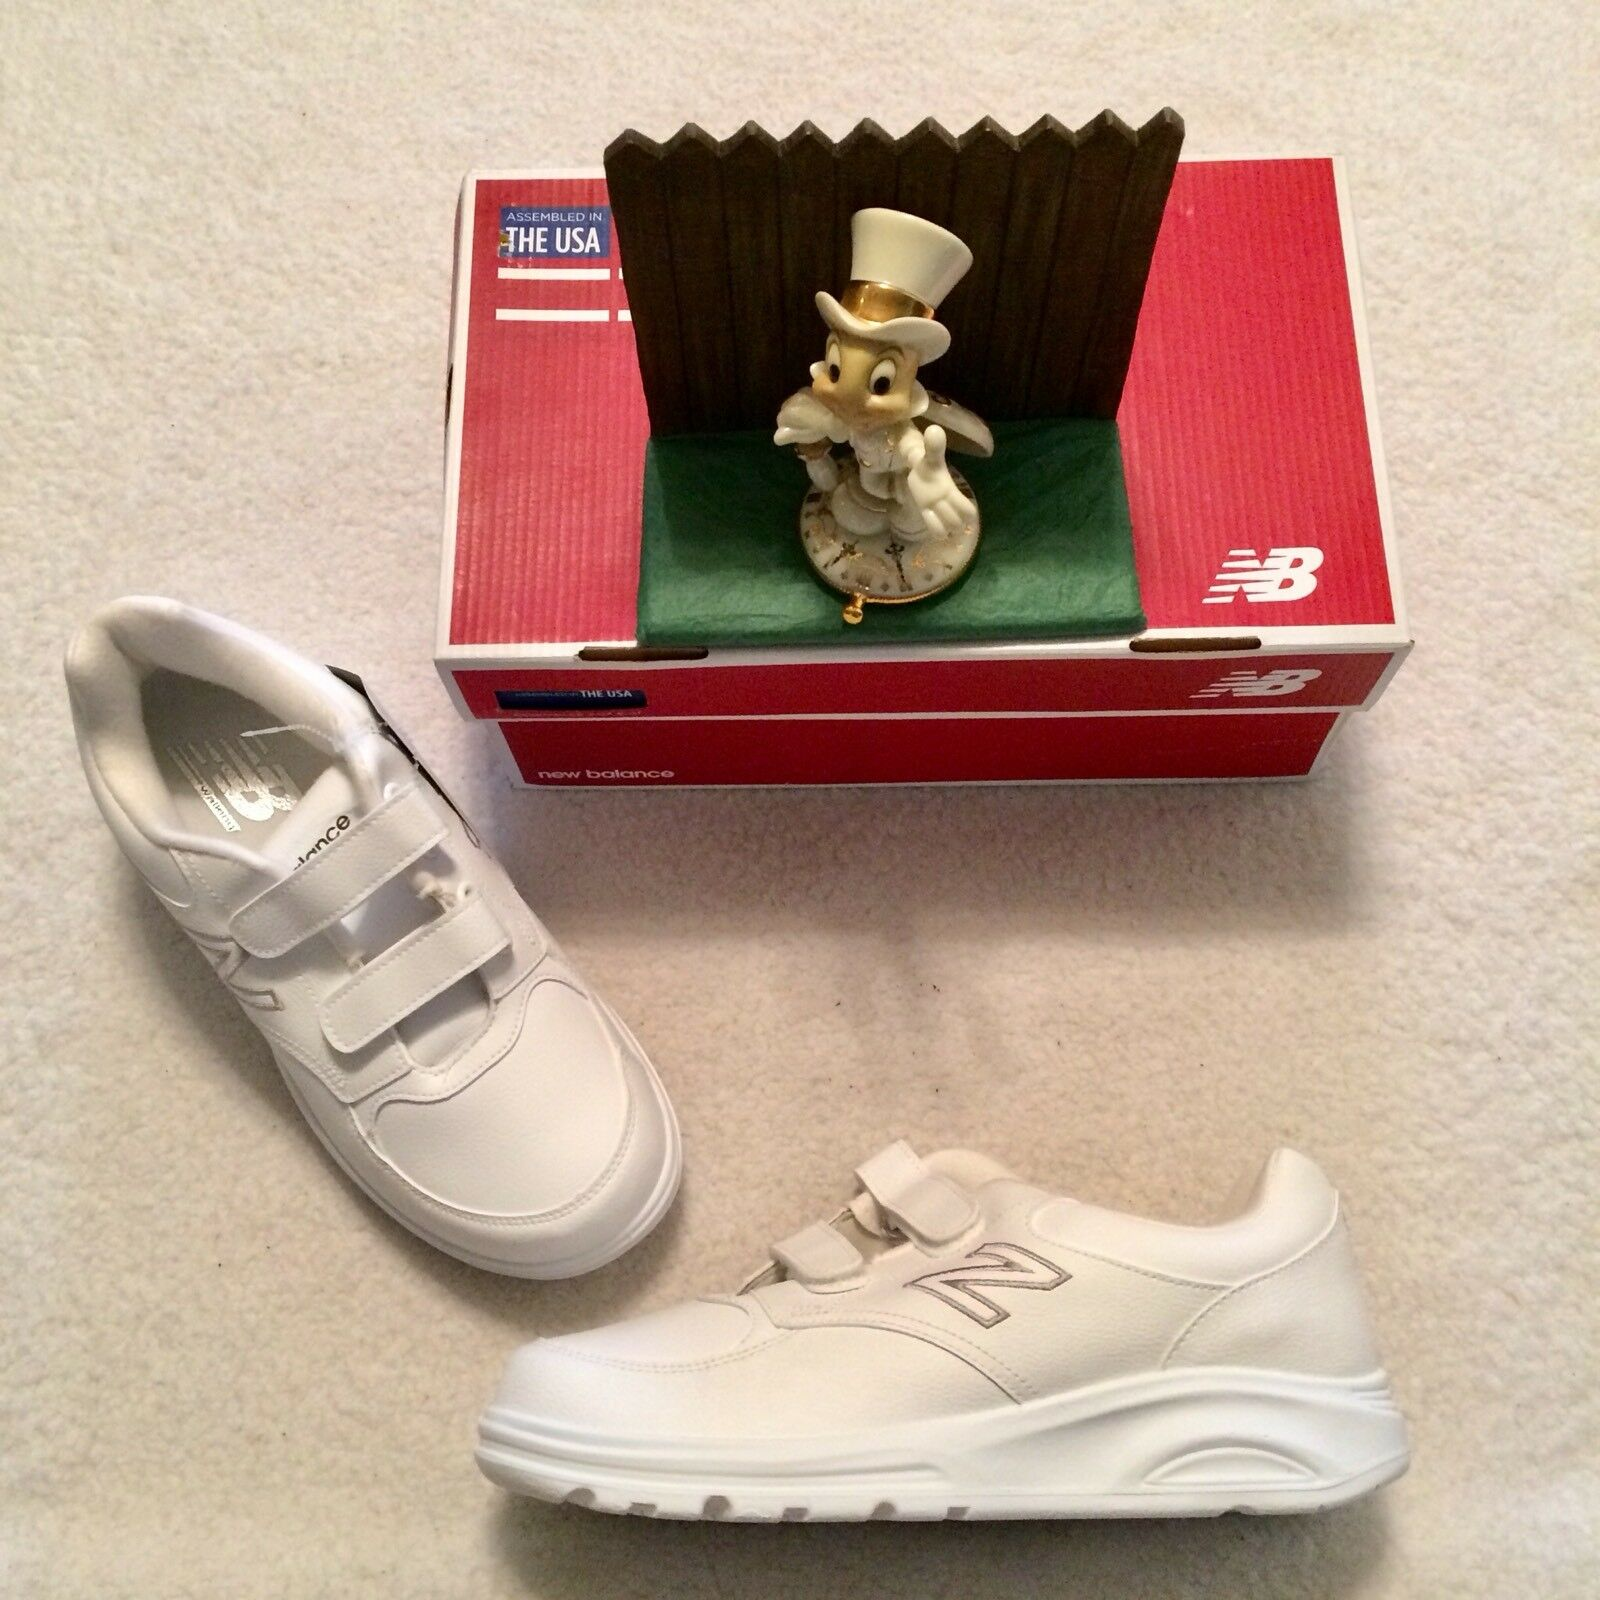 New New New Balance Uomo Walking 674 Hook and Loop scarpe bianca 10   44 4E New.. X WIDE 12c24b